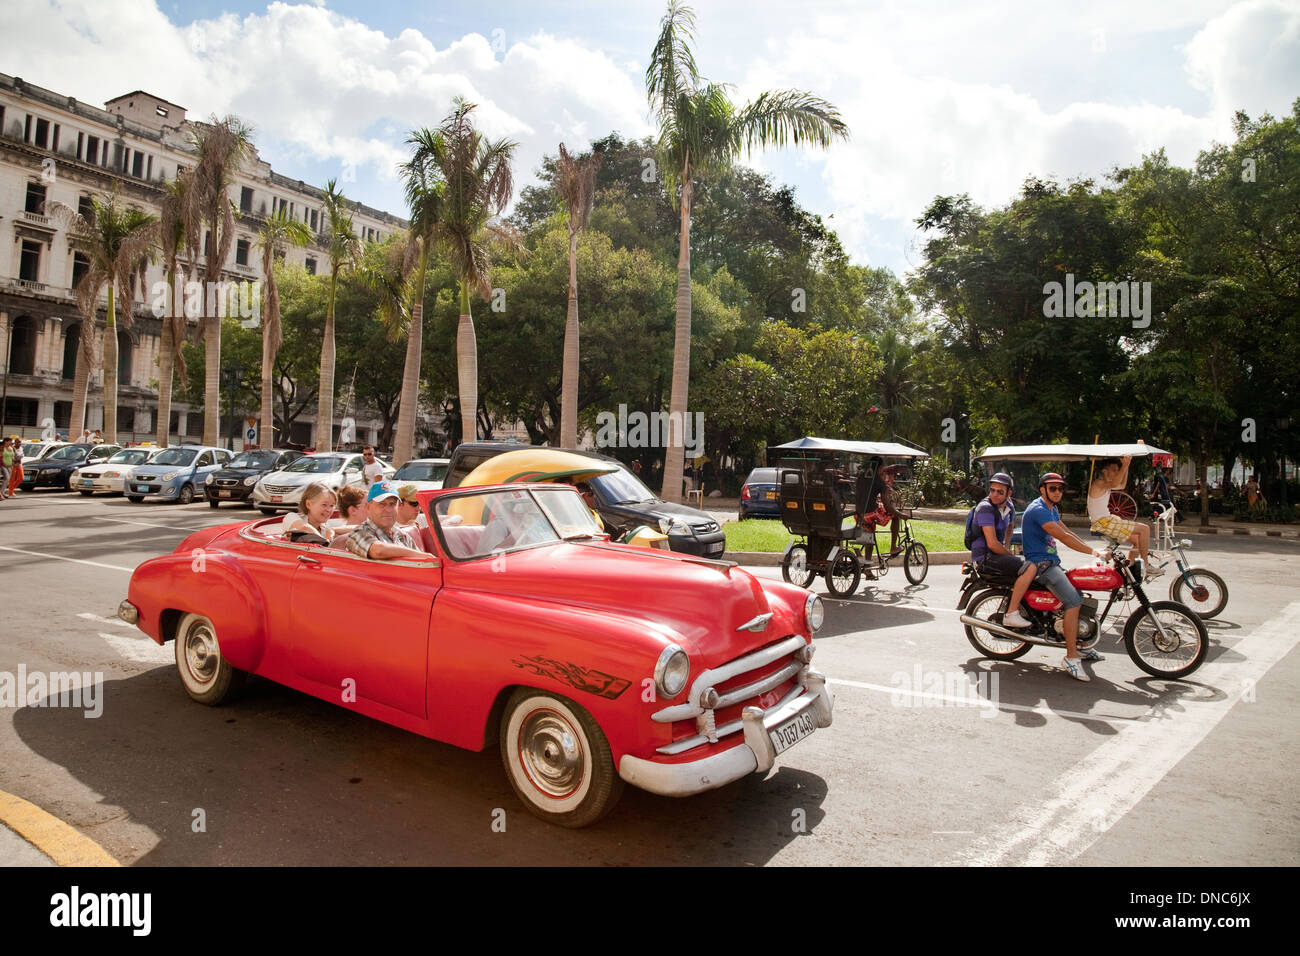 havana-cuba-street-scene-with-old-americ